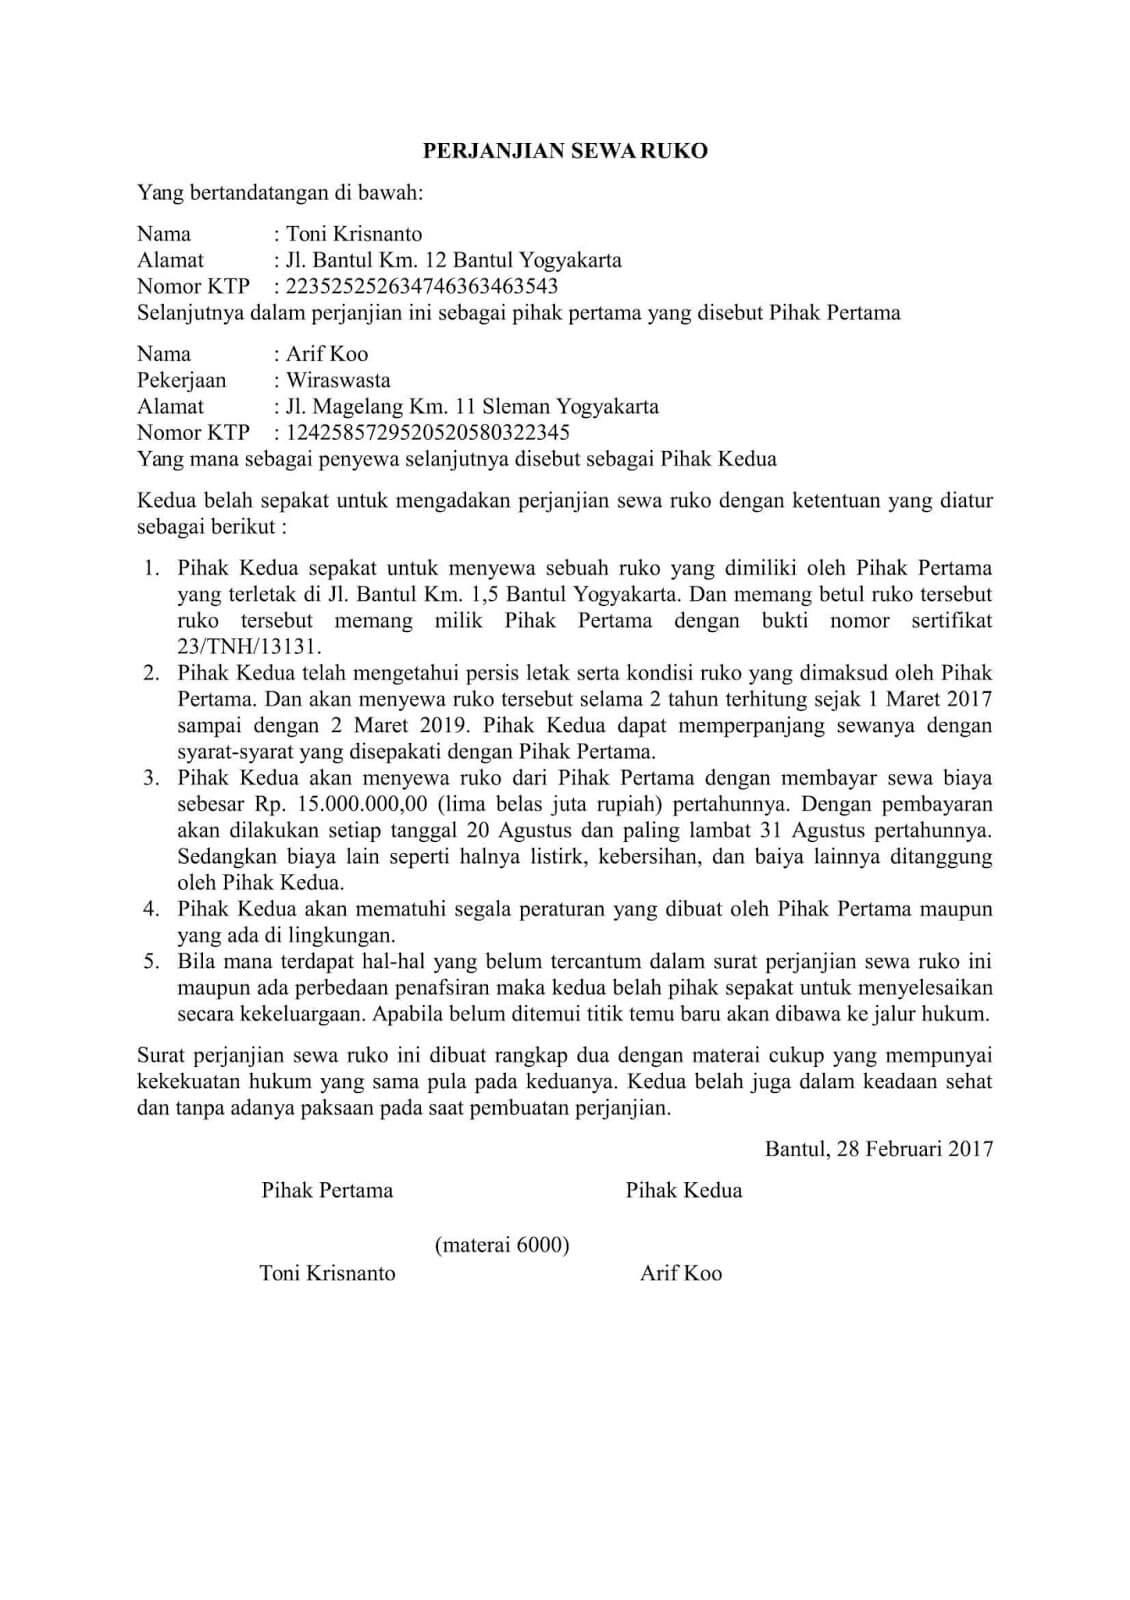 surat perjanjian sewamenyewarukopdf